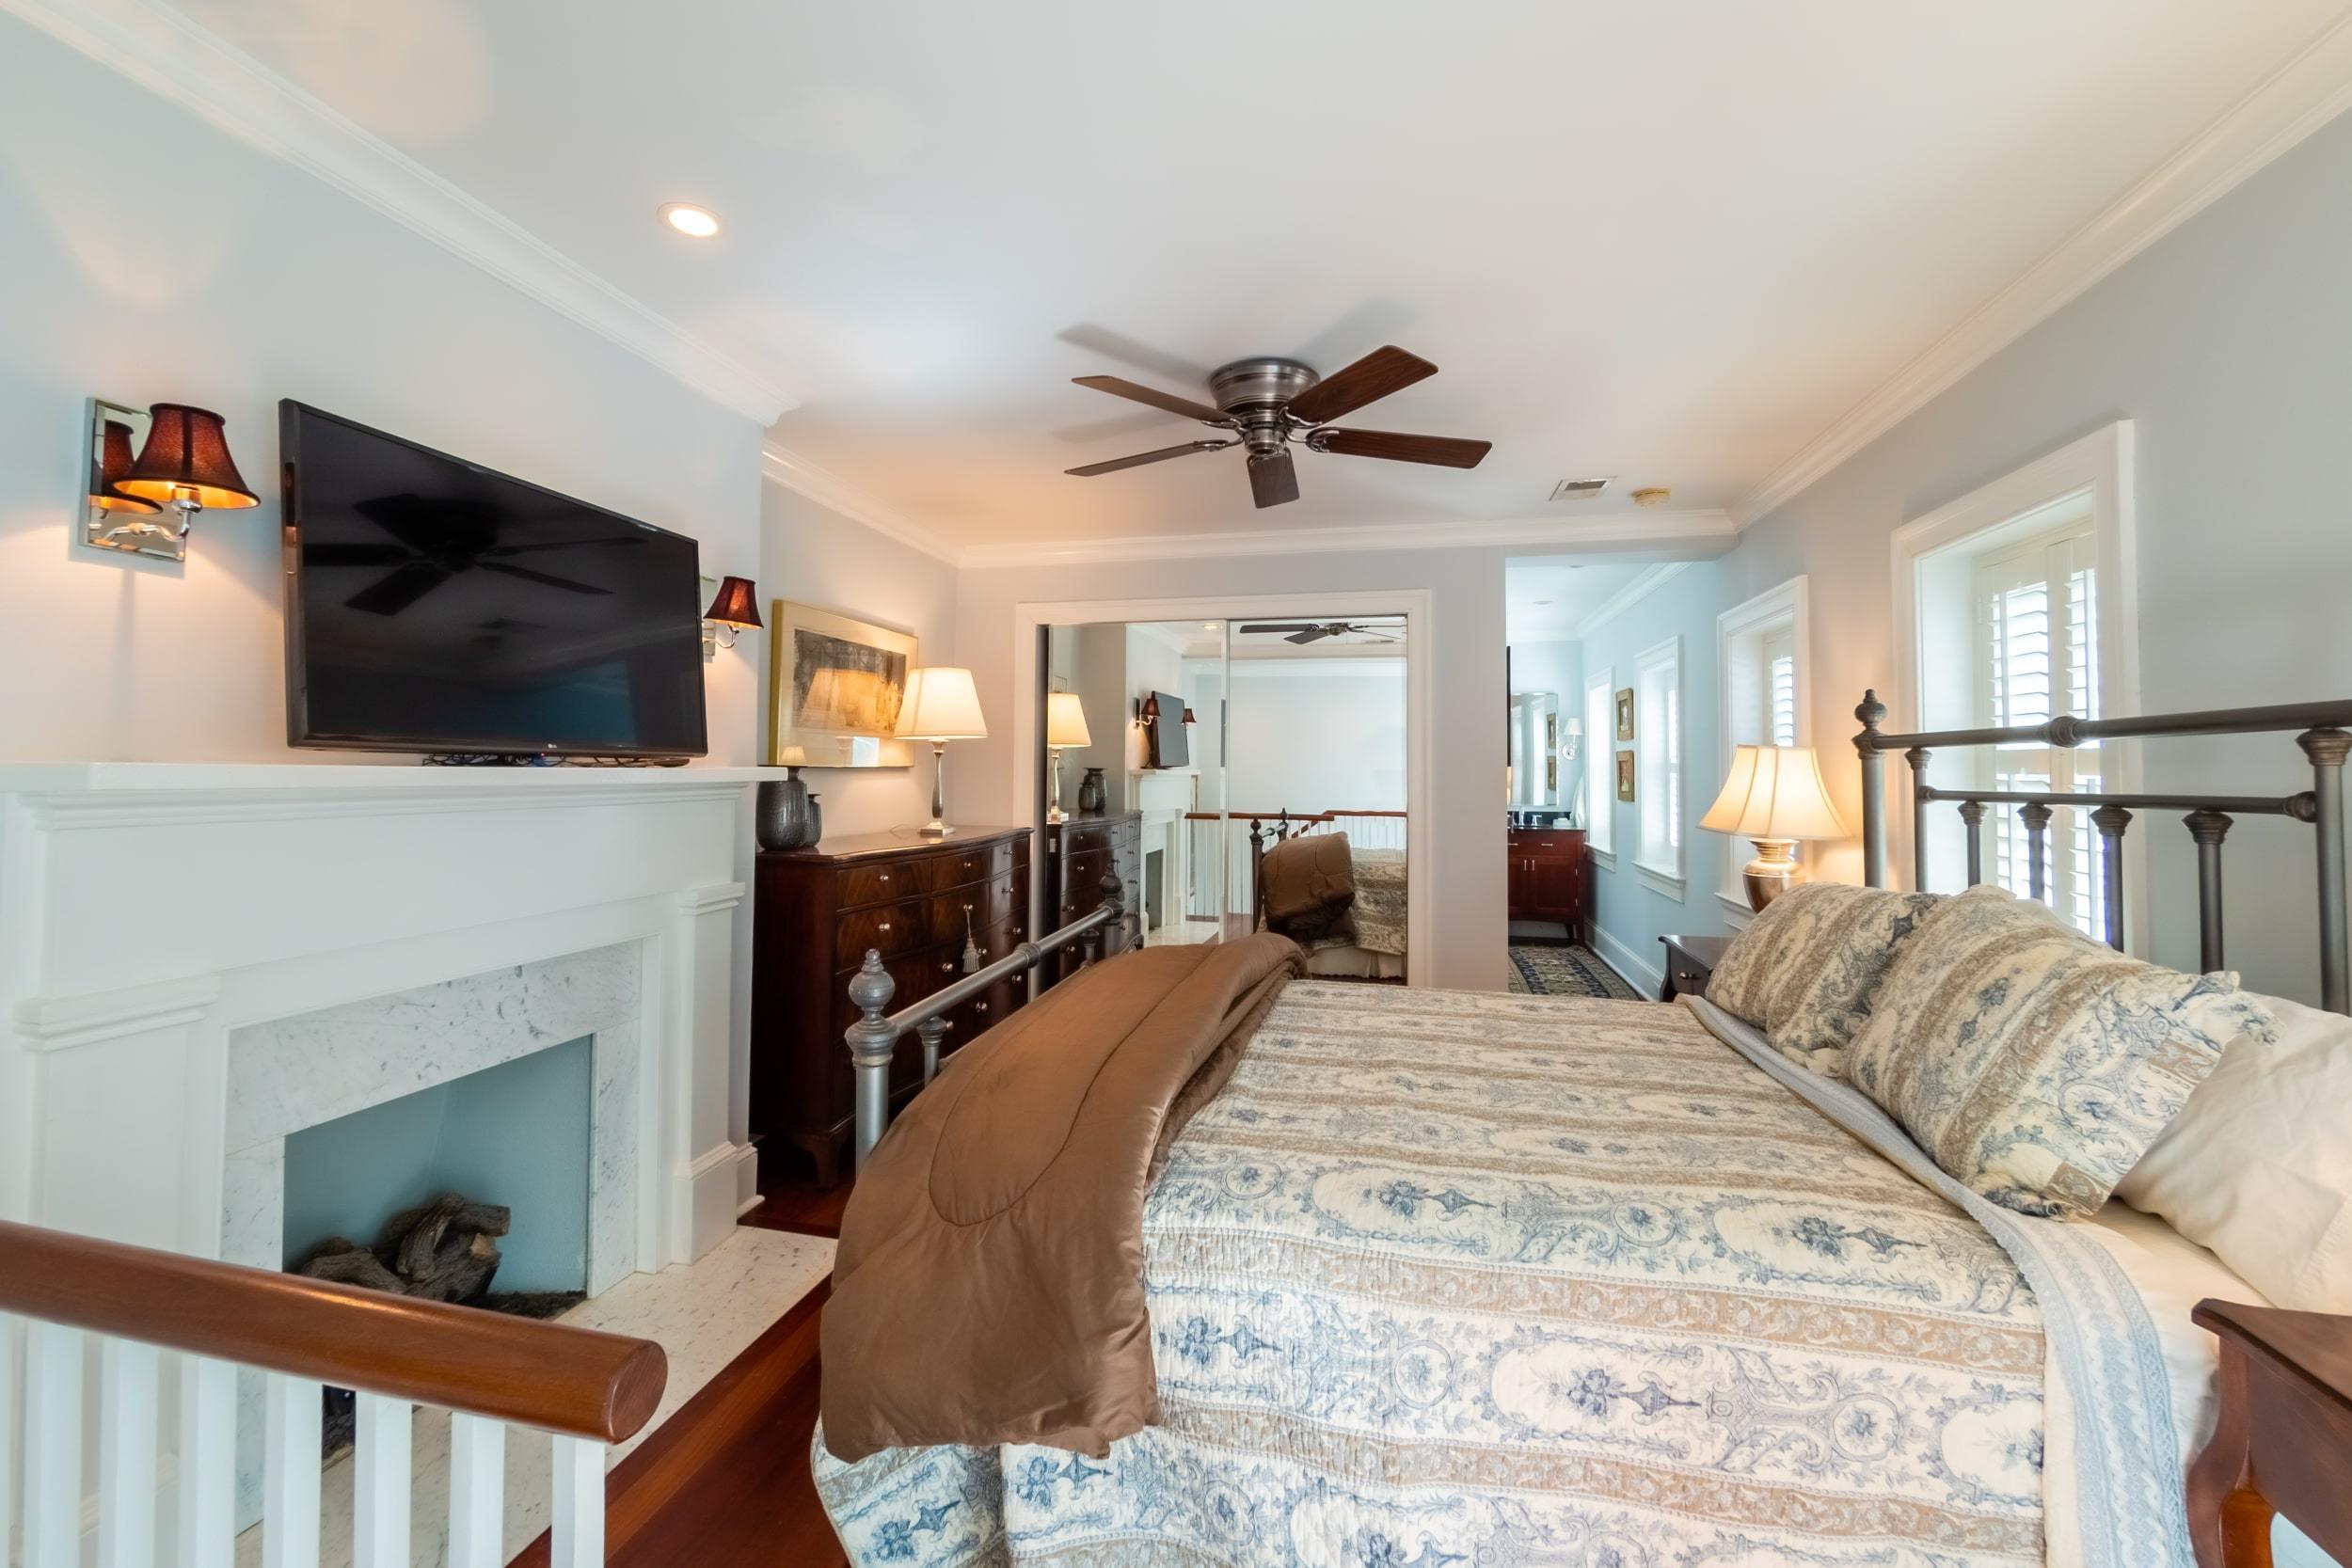 Harleston Village Homes For Sale - 7 Pitt, Charleston, SC - 5